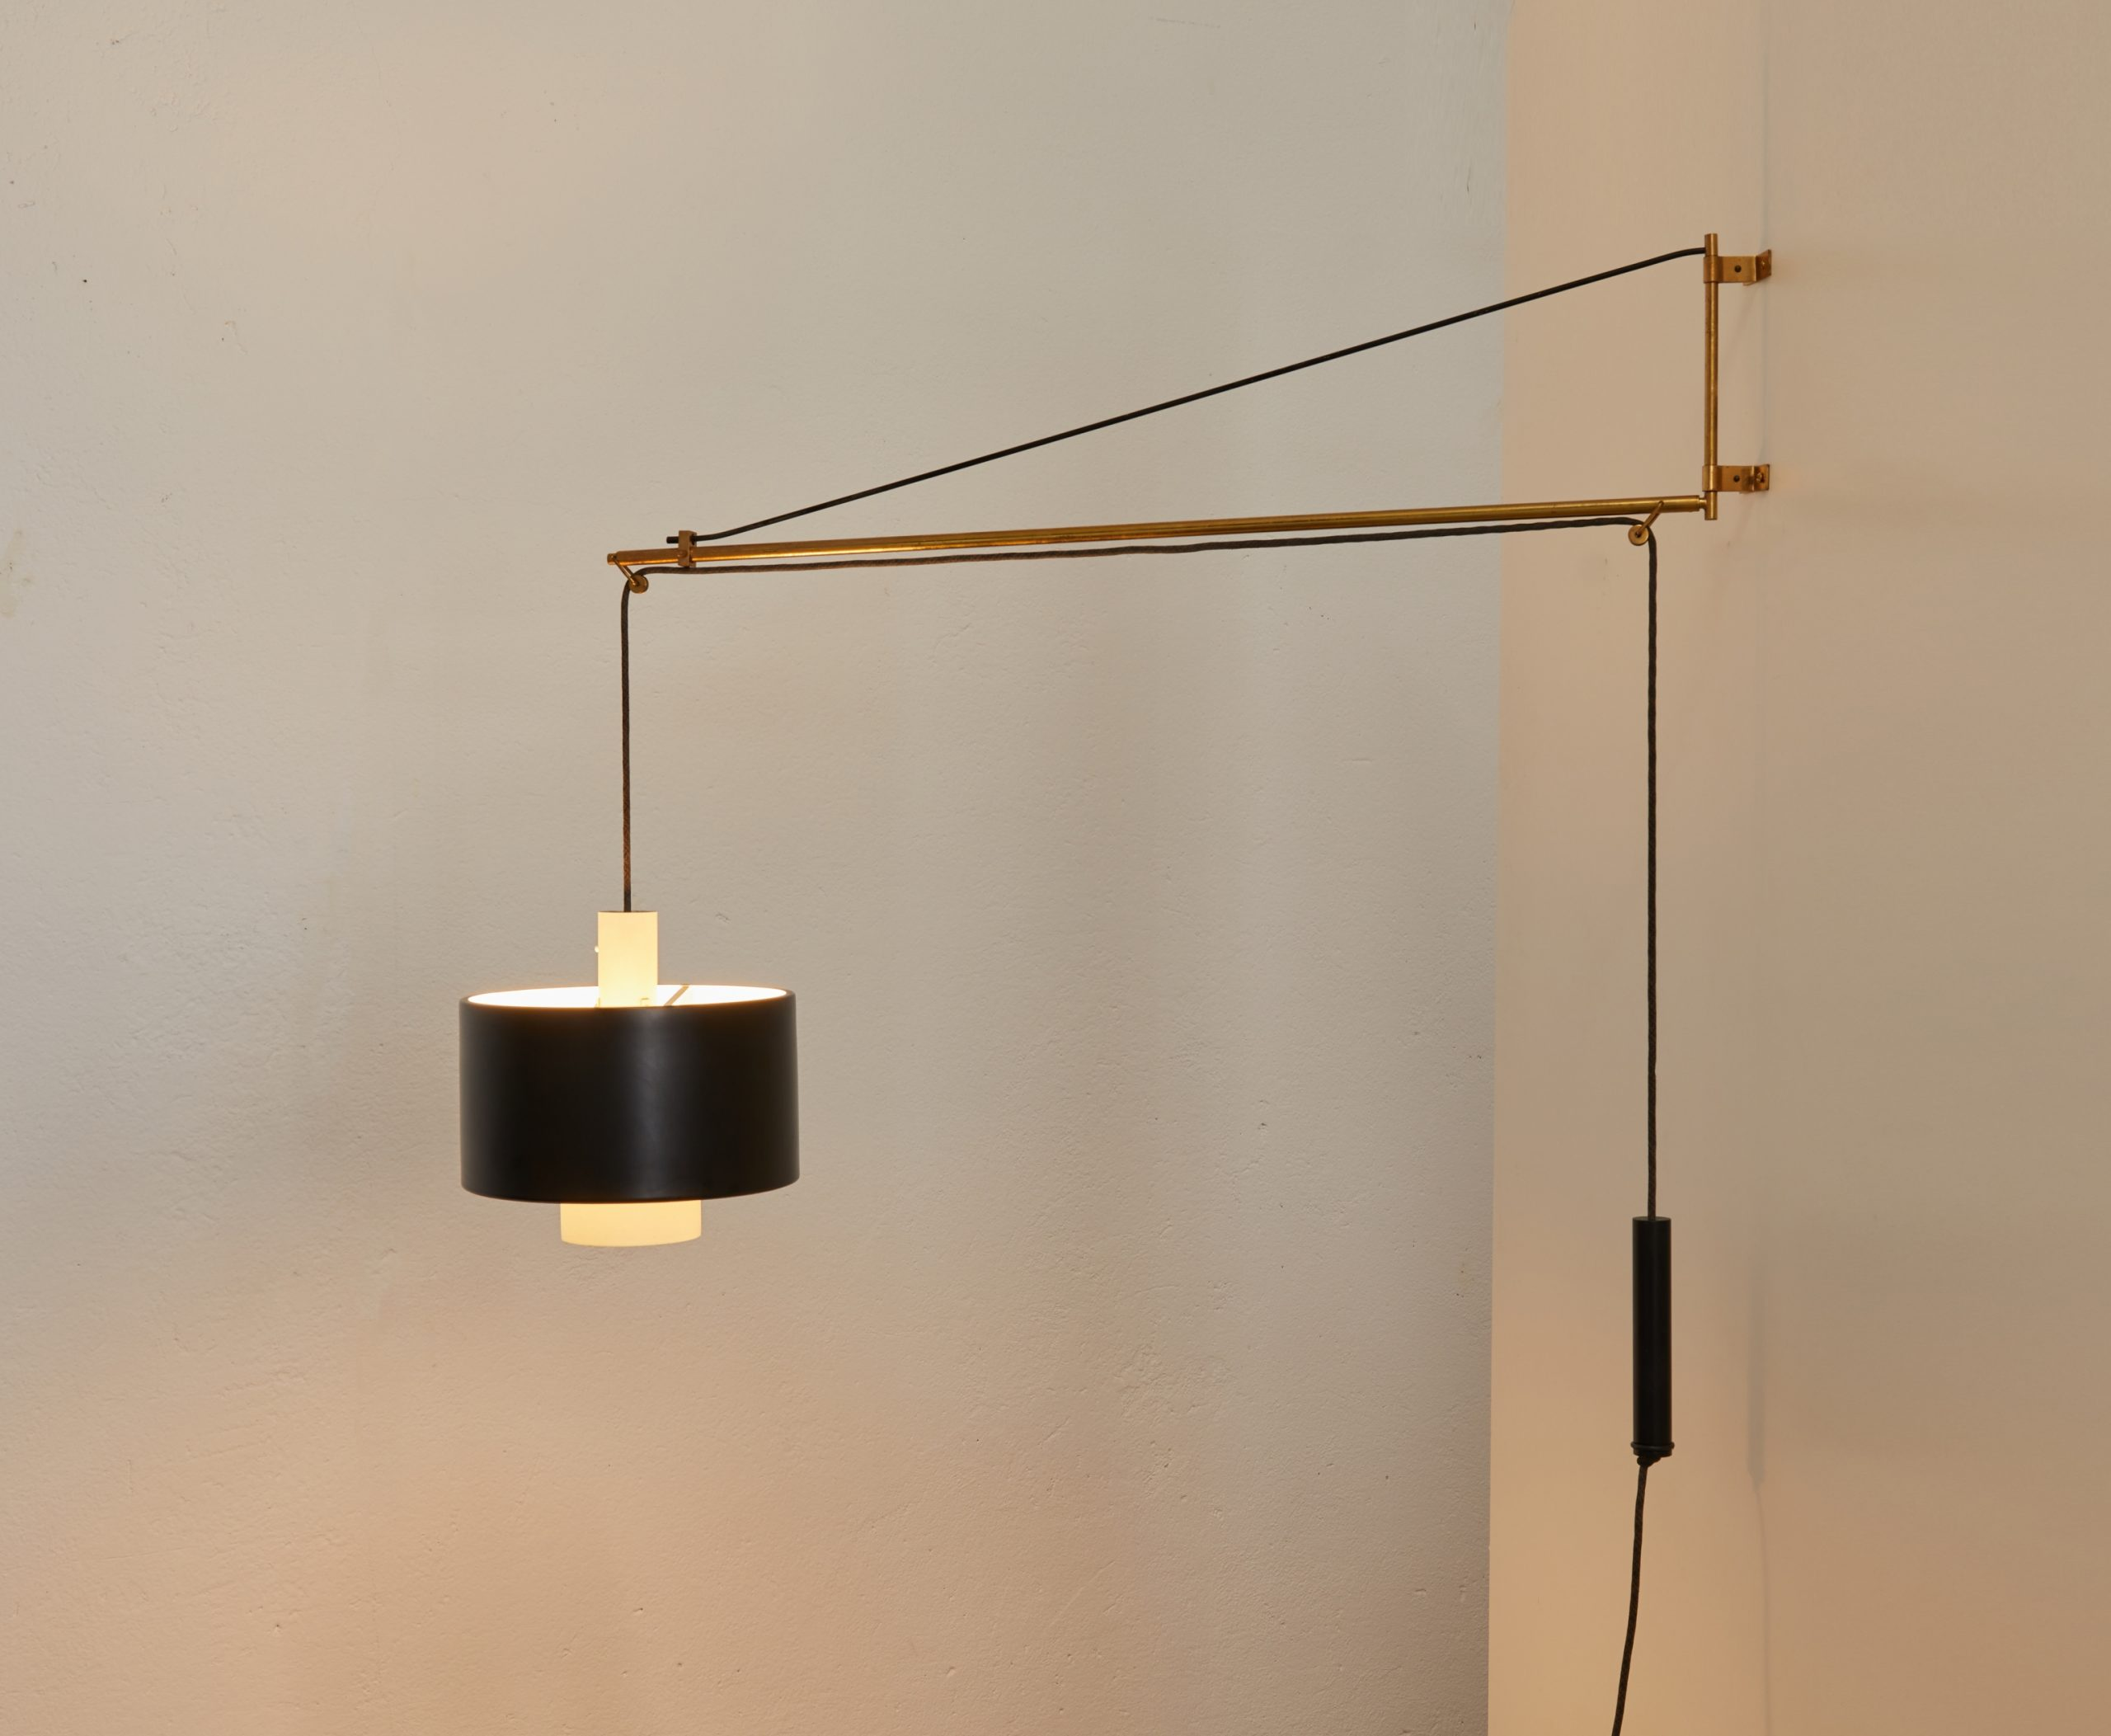 brass-wall-lamp-model-2061-by-gaetano-scolari-for-stilnovo-1954-image-01